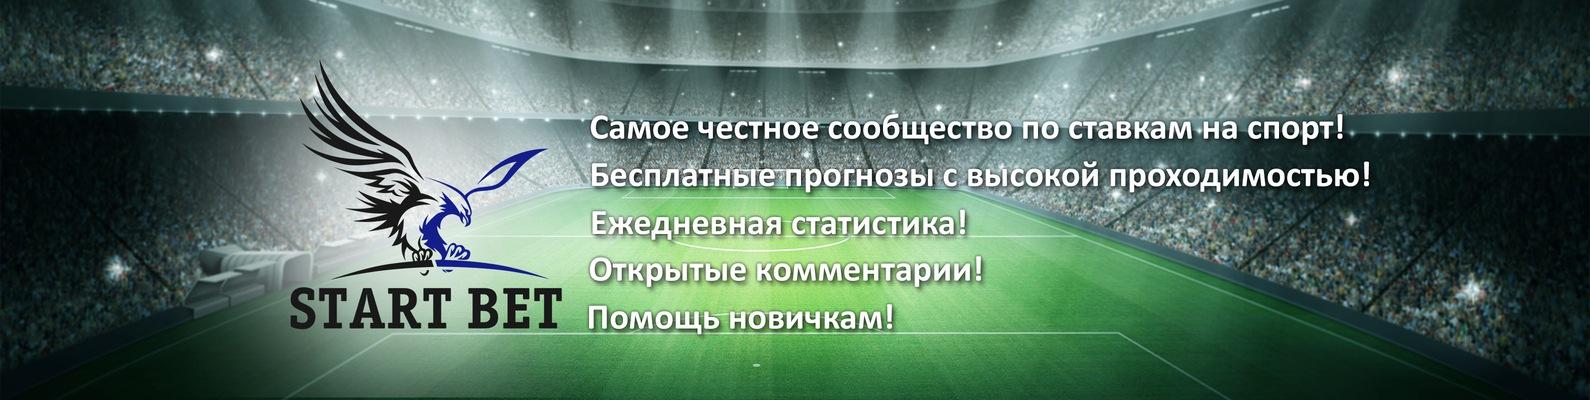 Покупка ставки на спорт отзывы лига fansport онлайн